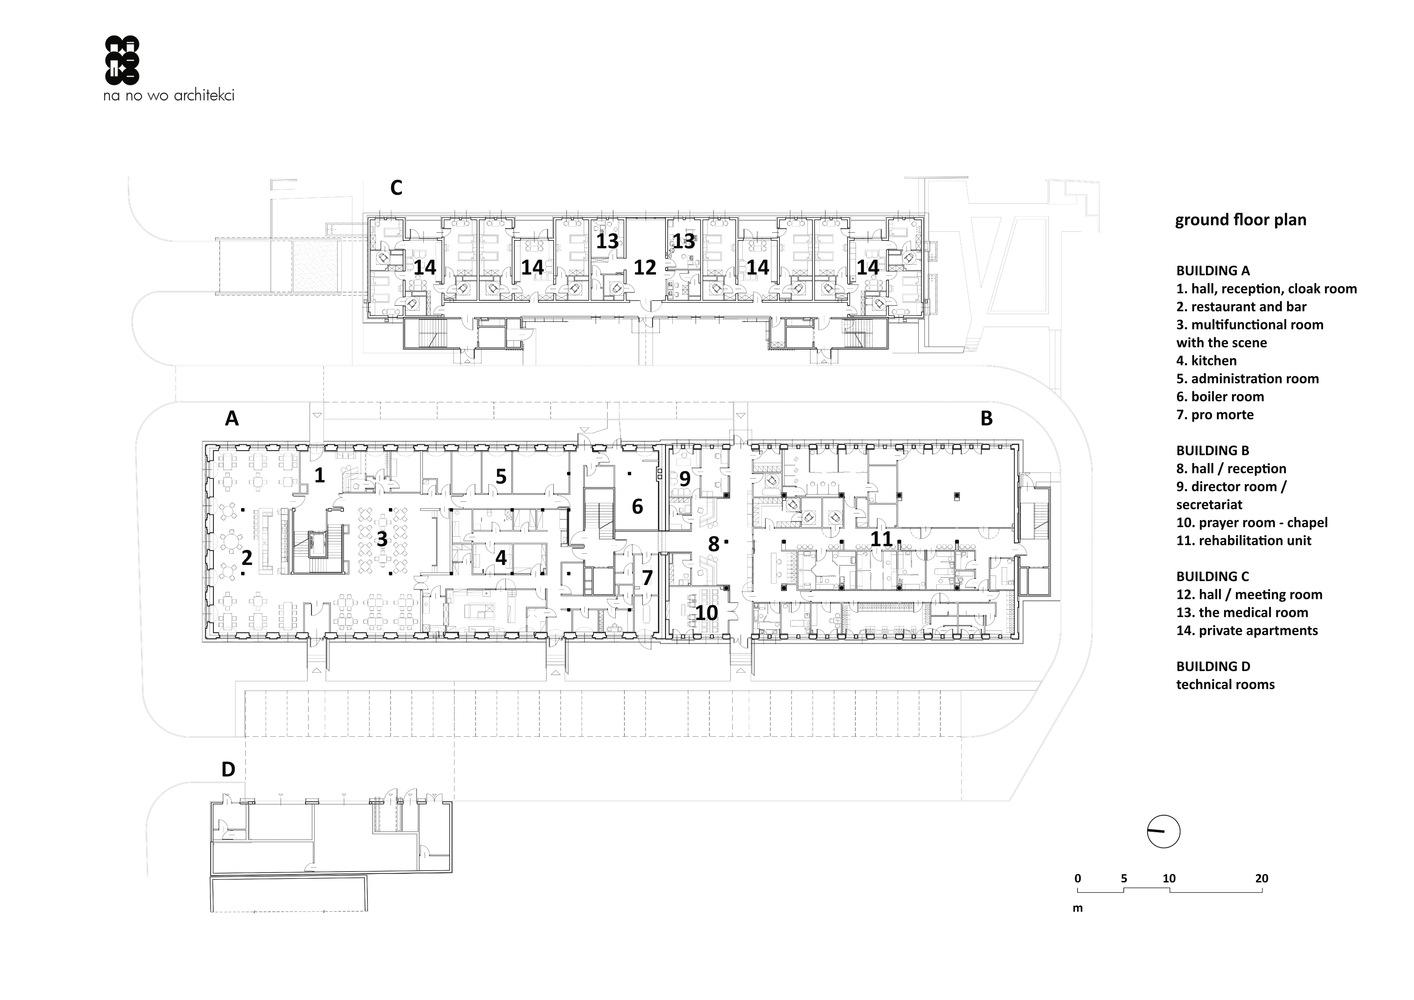 leszczynski antoniny manor intervention na no wo architekci [ 1414 x 1000 Pixel ]